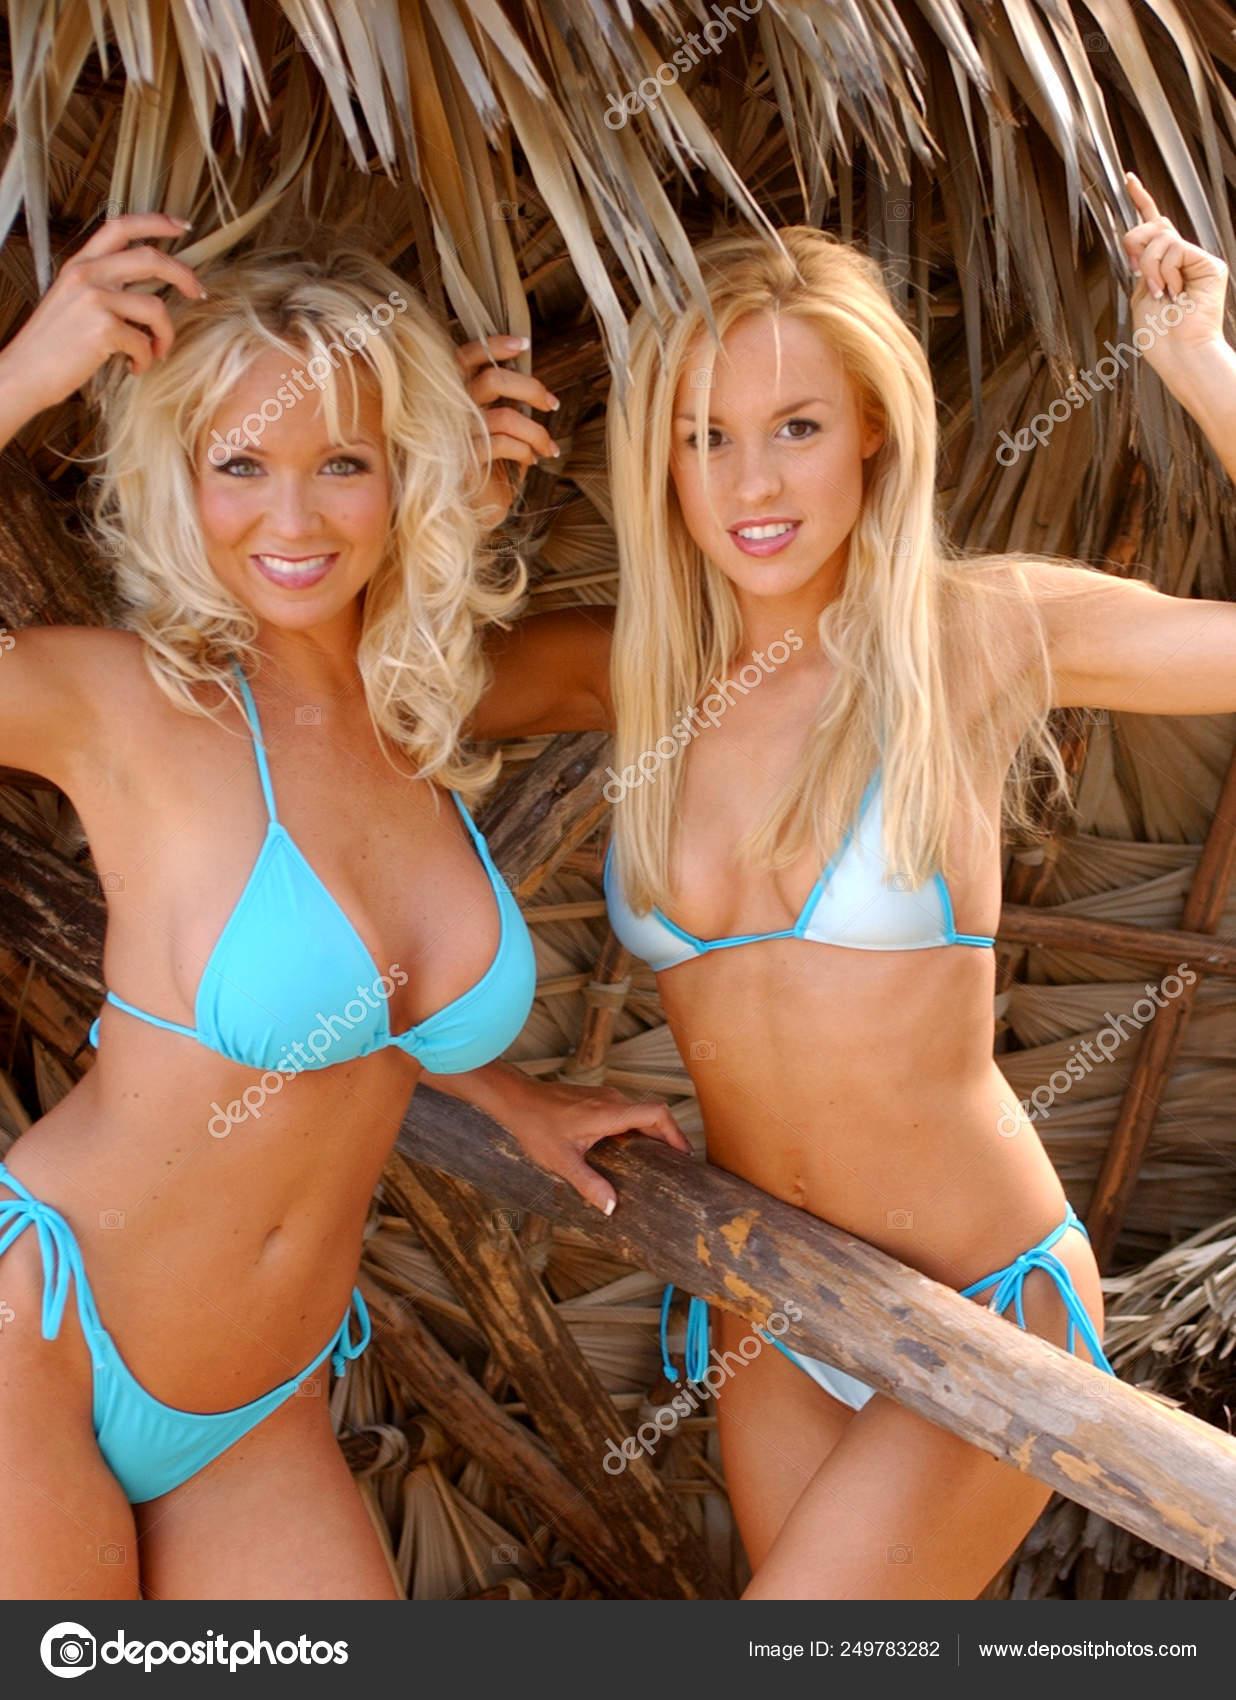 Calendario Ragazze.Celebrita Modelle Lauren Thompson Playboy Modello Mandy